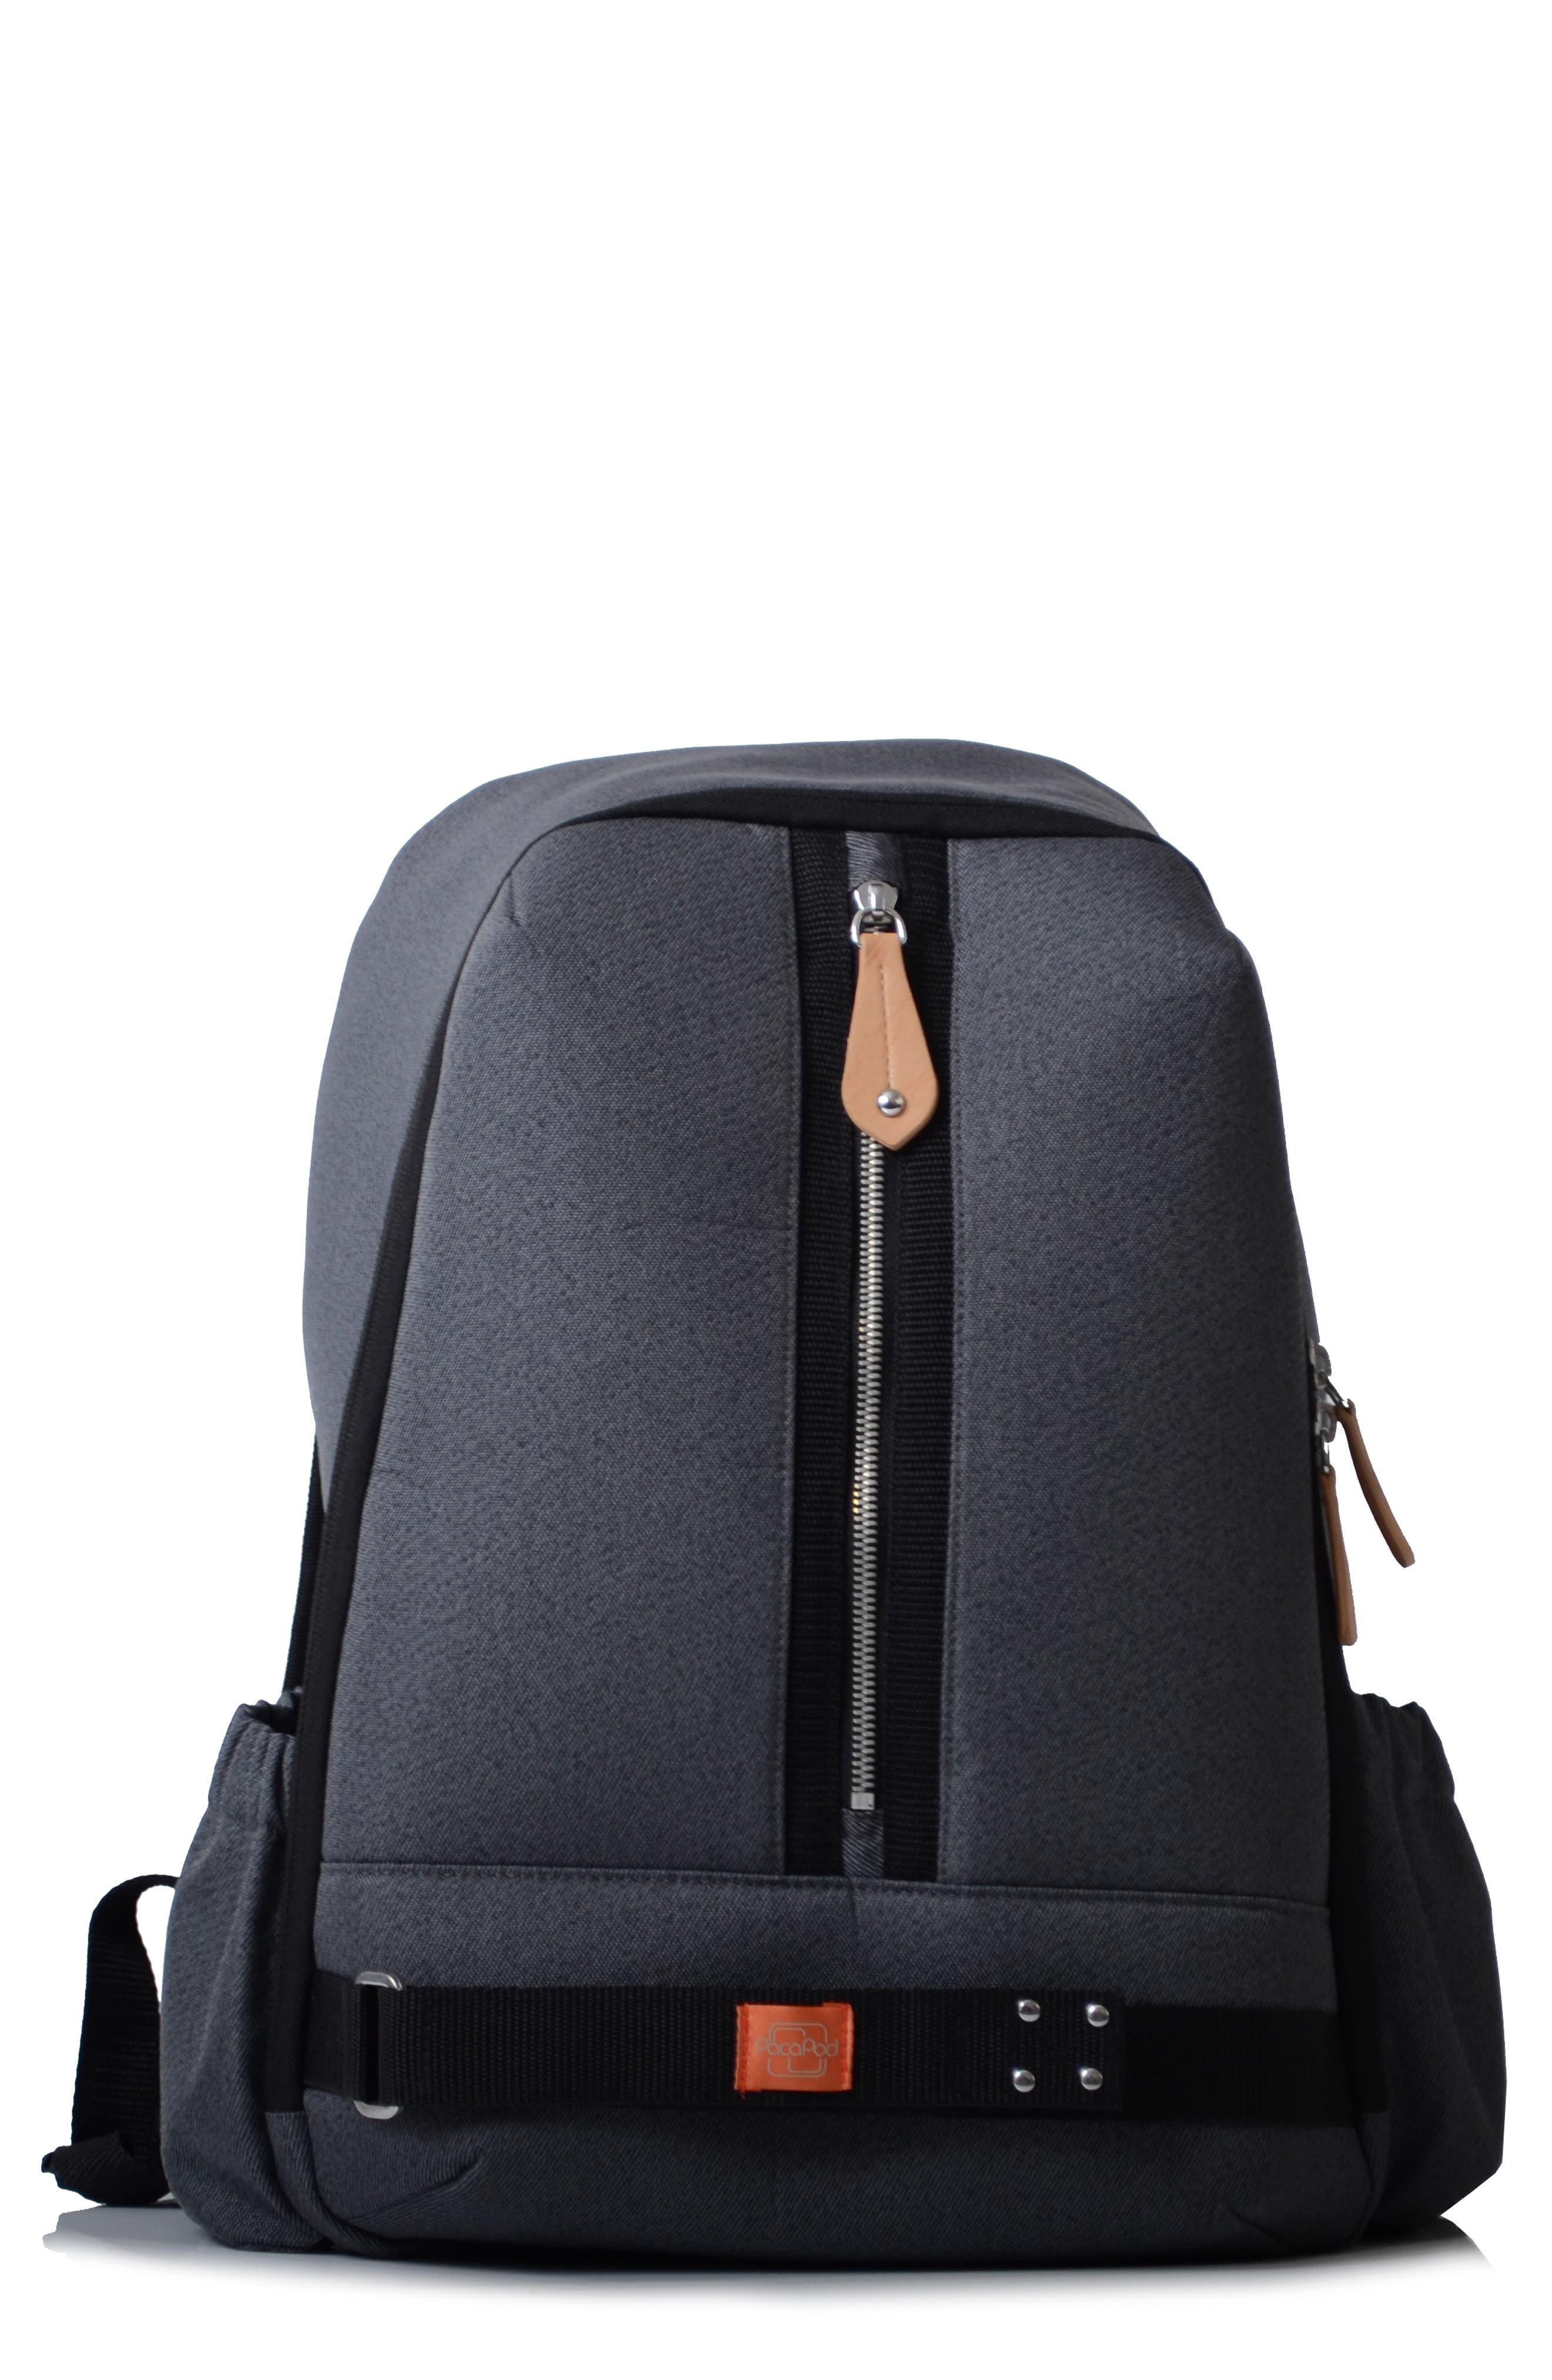 Picos Pack Diaper Backpack,                             Main thumbnail 1, color,                             Black Charcoal